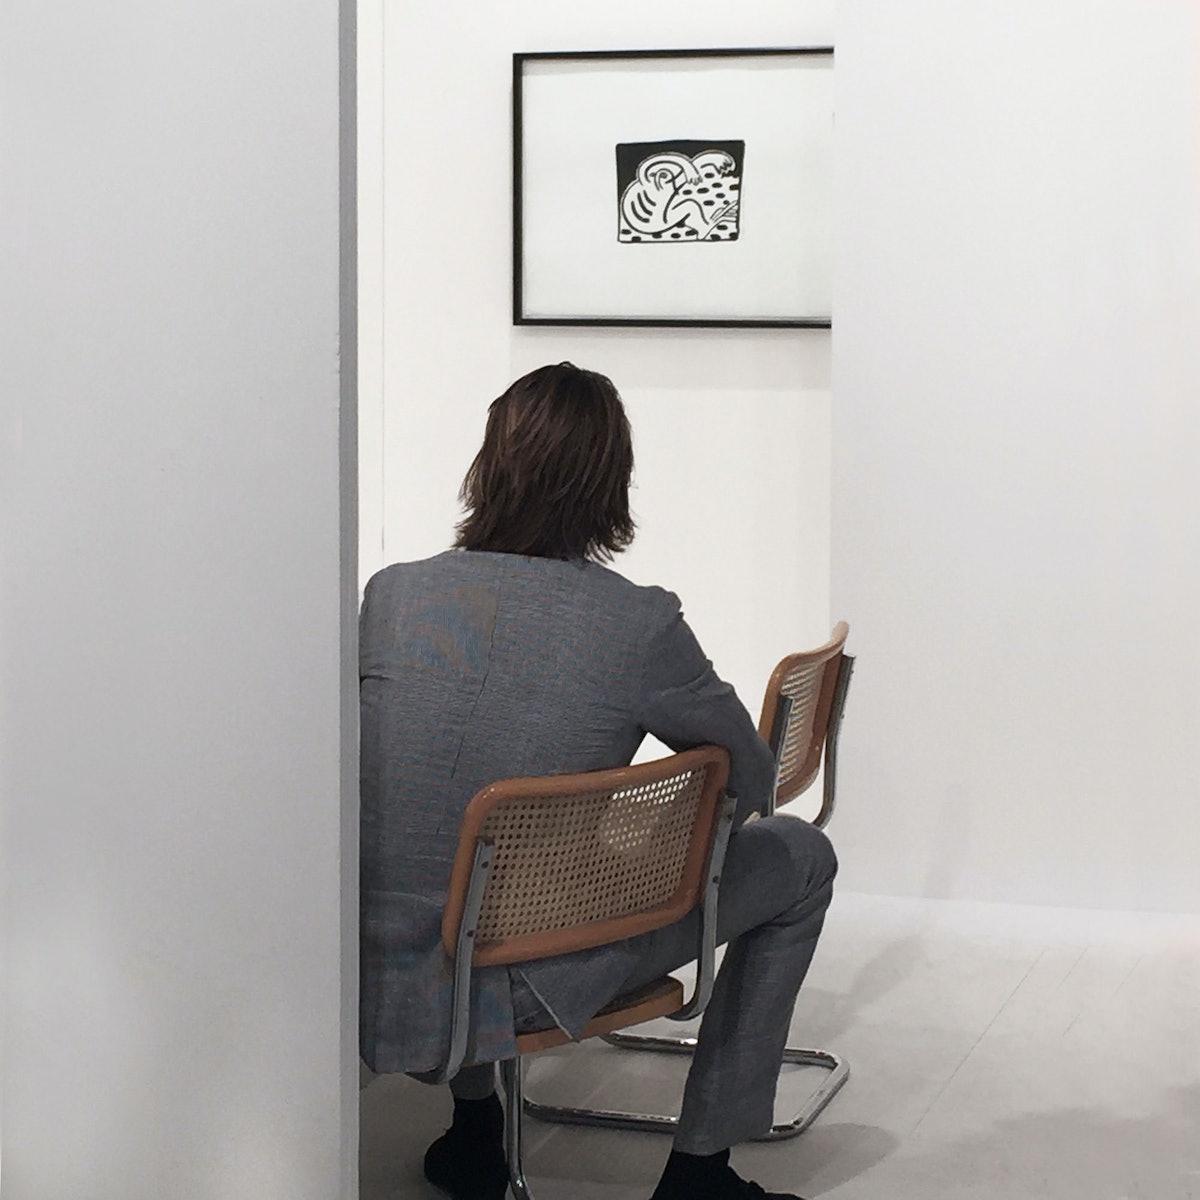 At Galerie Hans Meyer